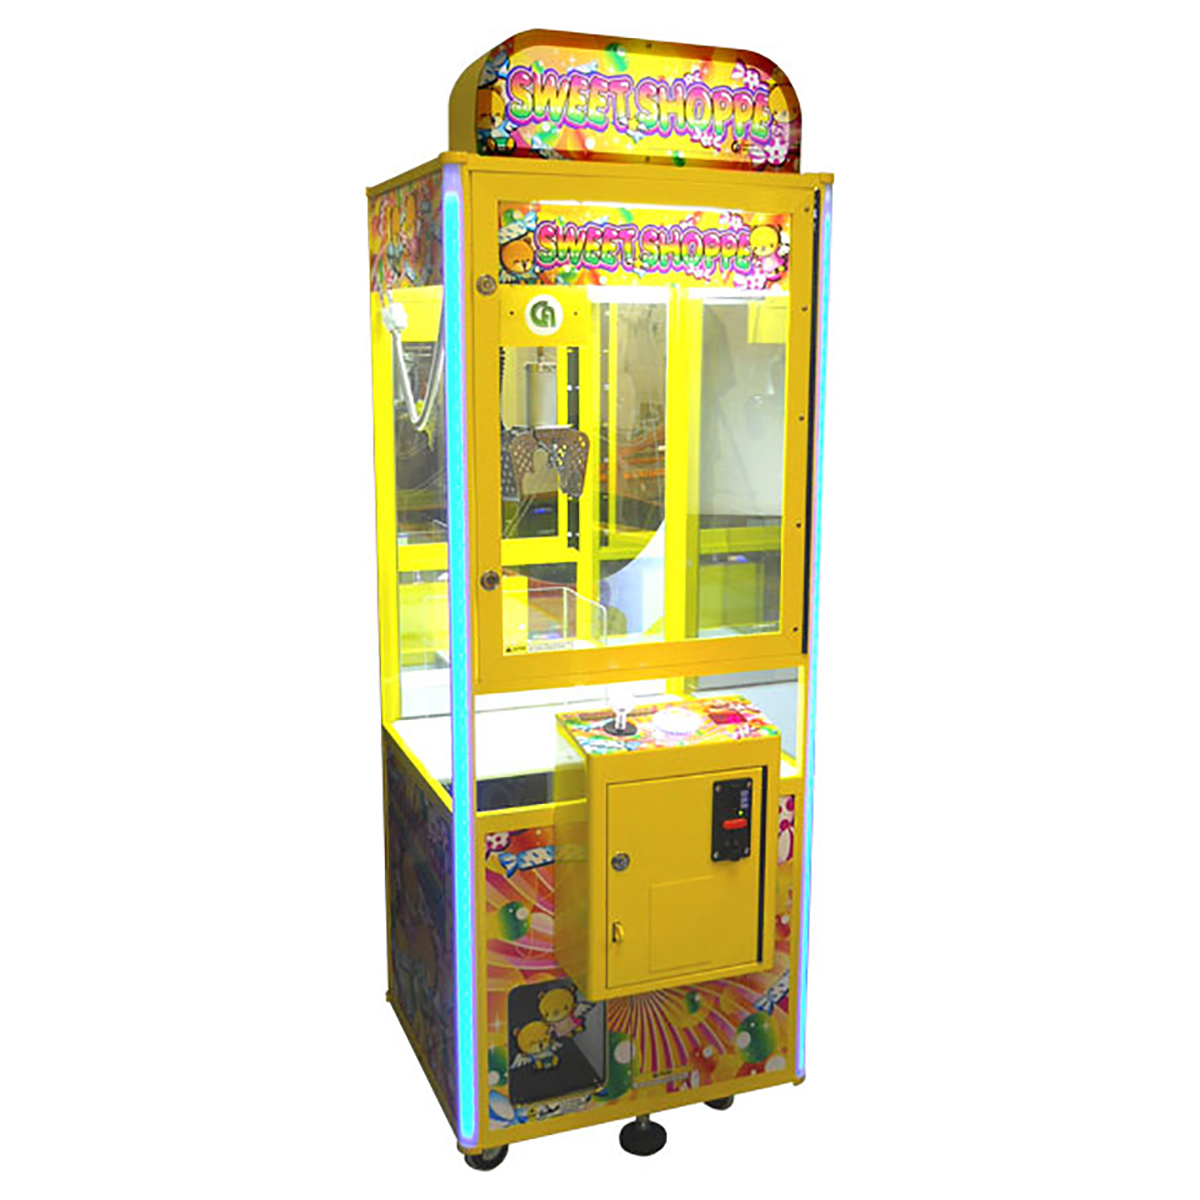 Sweet Shoppe Candy Crane Claw Machine | Game Room Guys